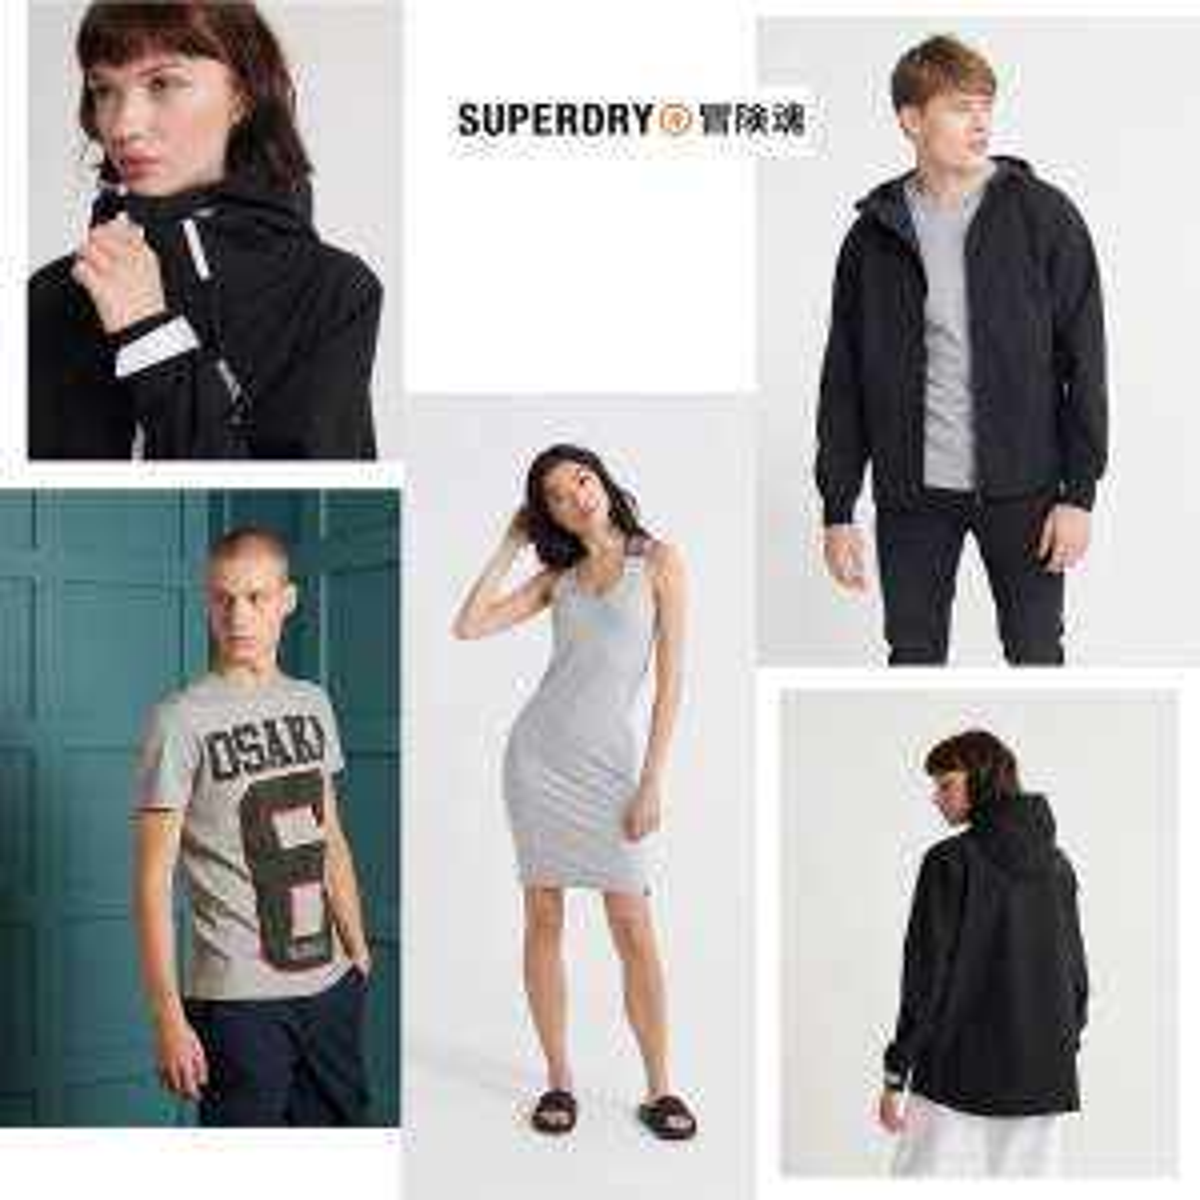 SUPERDRY - dames & heren: 53-65% korting